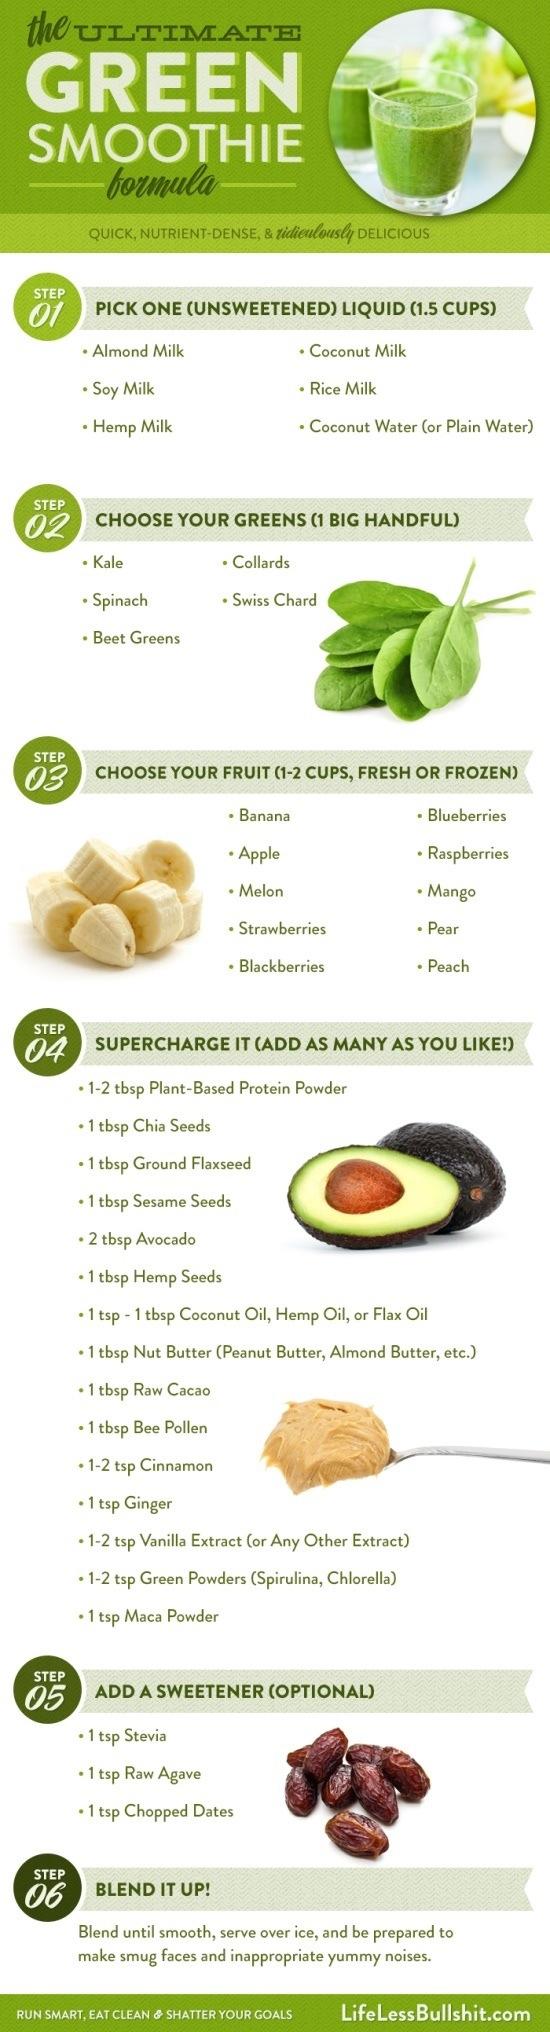 Green smoothie recipe! http://jackiesalsareup.com/alkaline #weightlossbeforeandafter